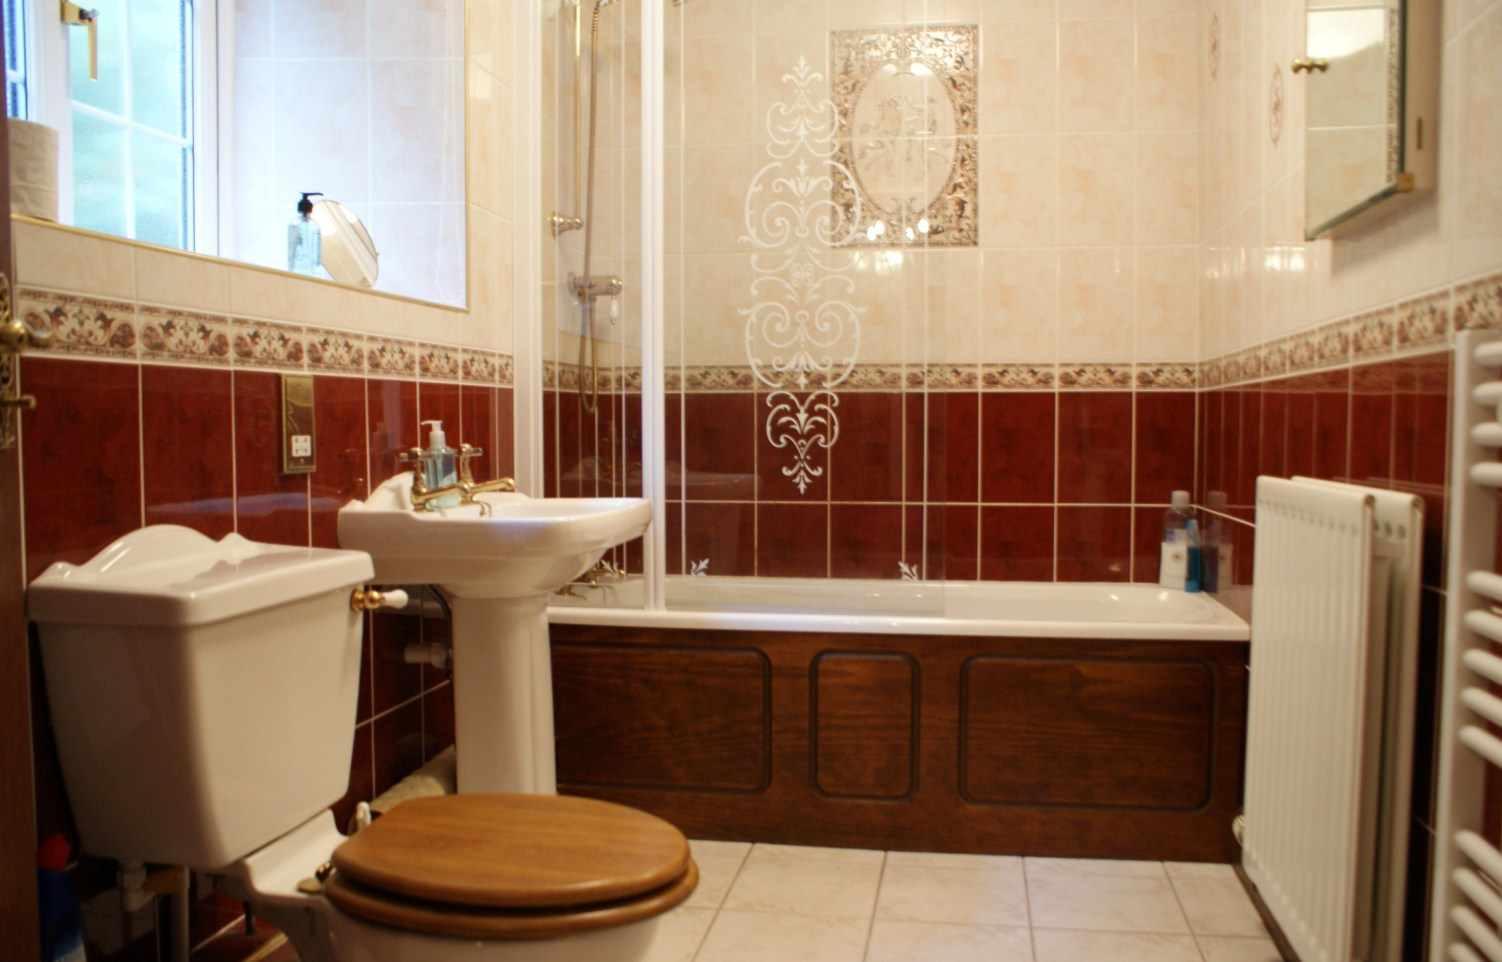 retro-bathroom-tile-design-ideas